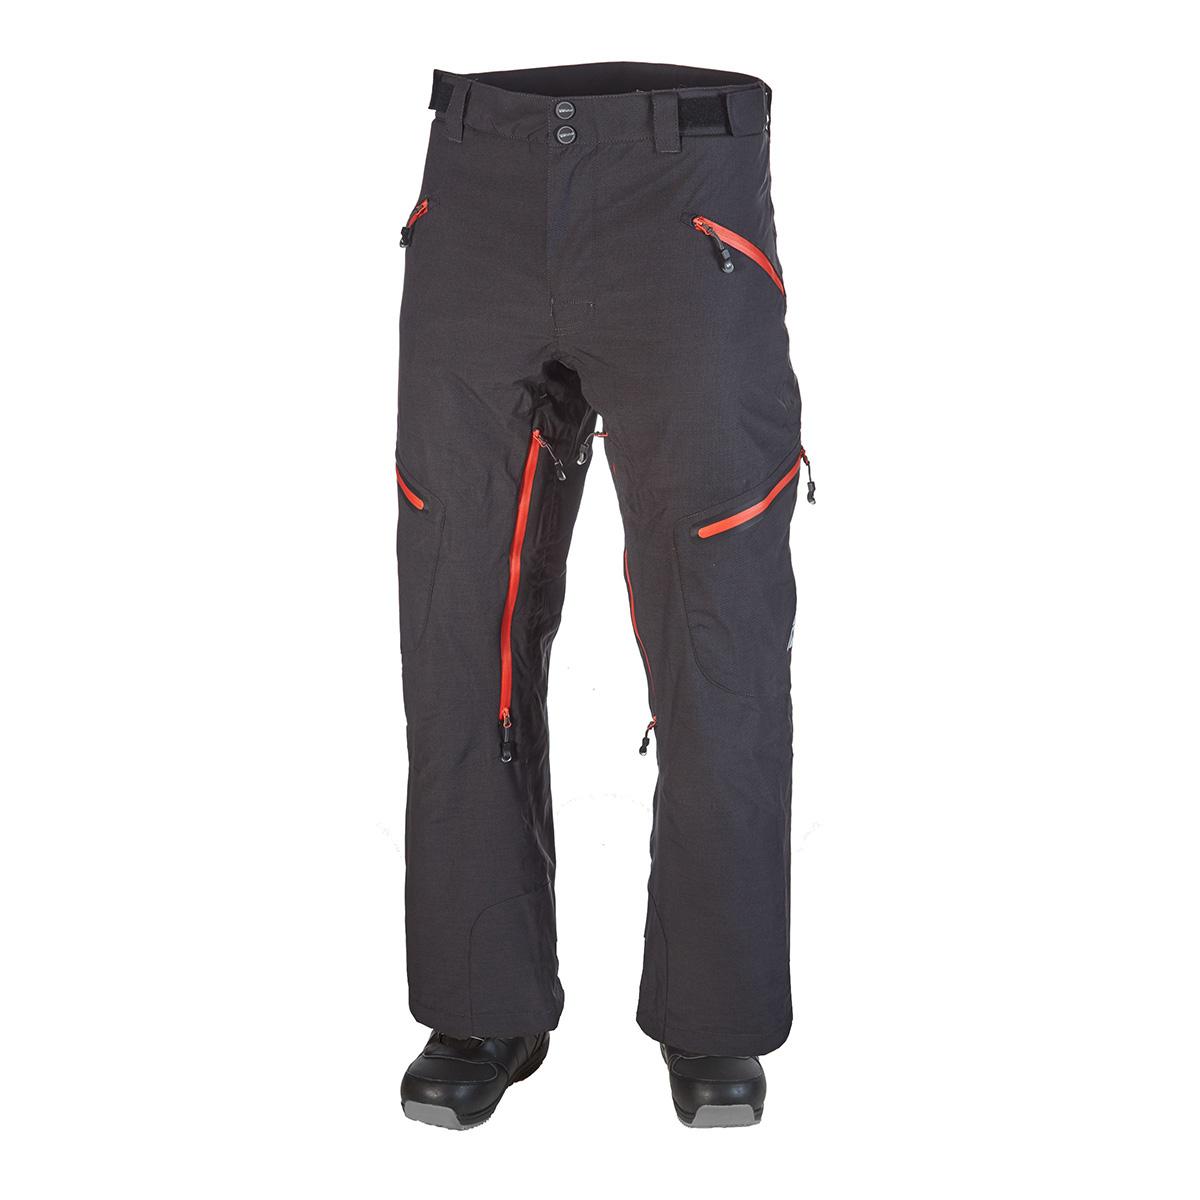 Kalhoty lyžařské pánské REHALL RORY